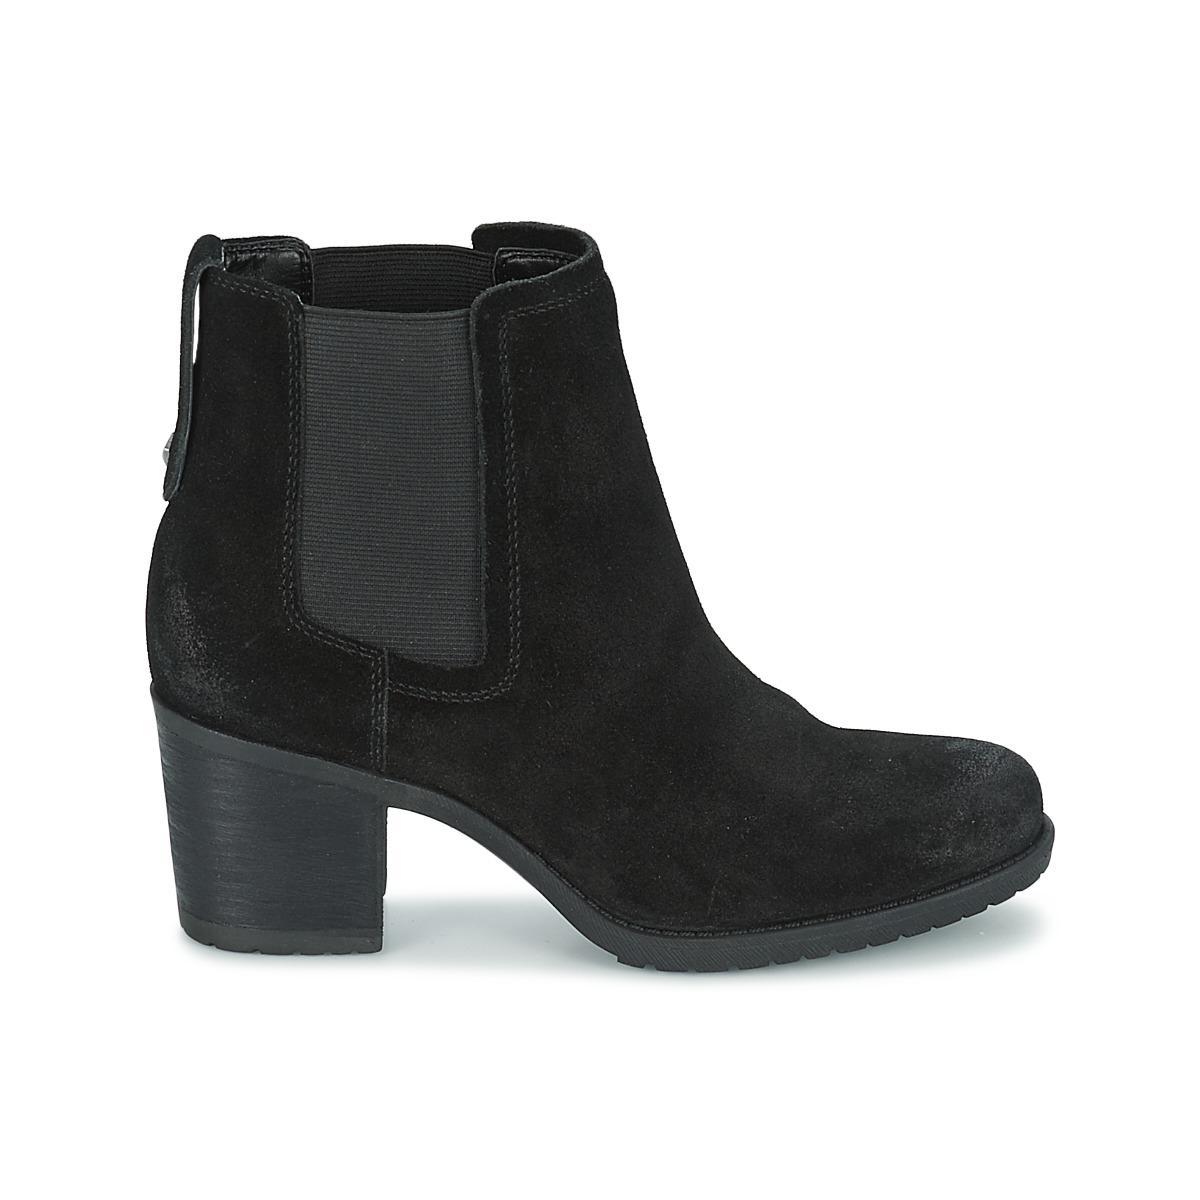 64c465d76c2 Sam Edelman - Hanley Women s Low Ankle Boots In Black - Lyst. View  fullscreen